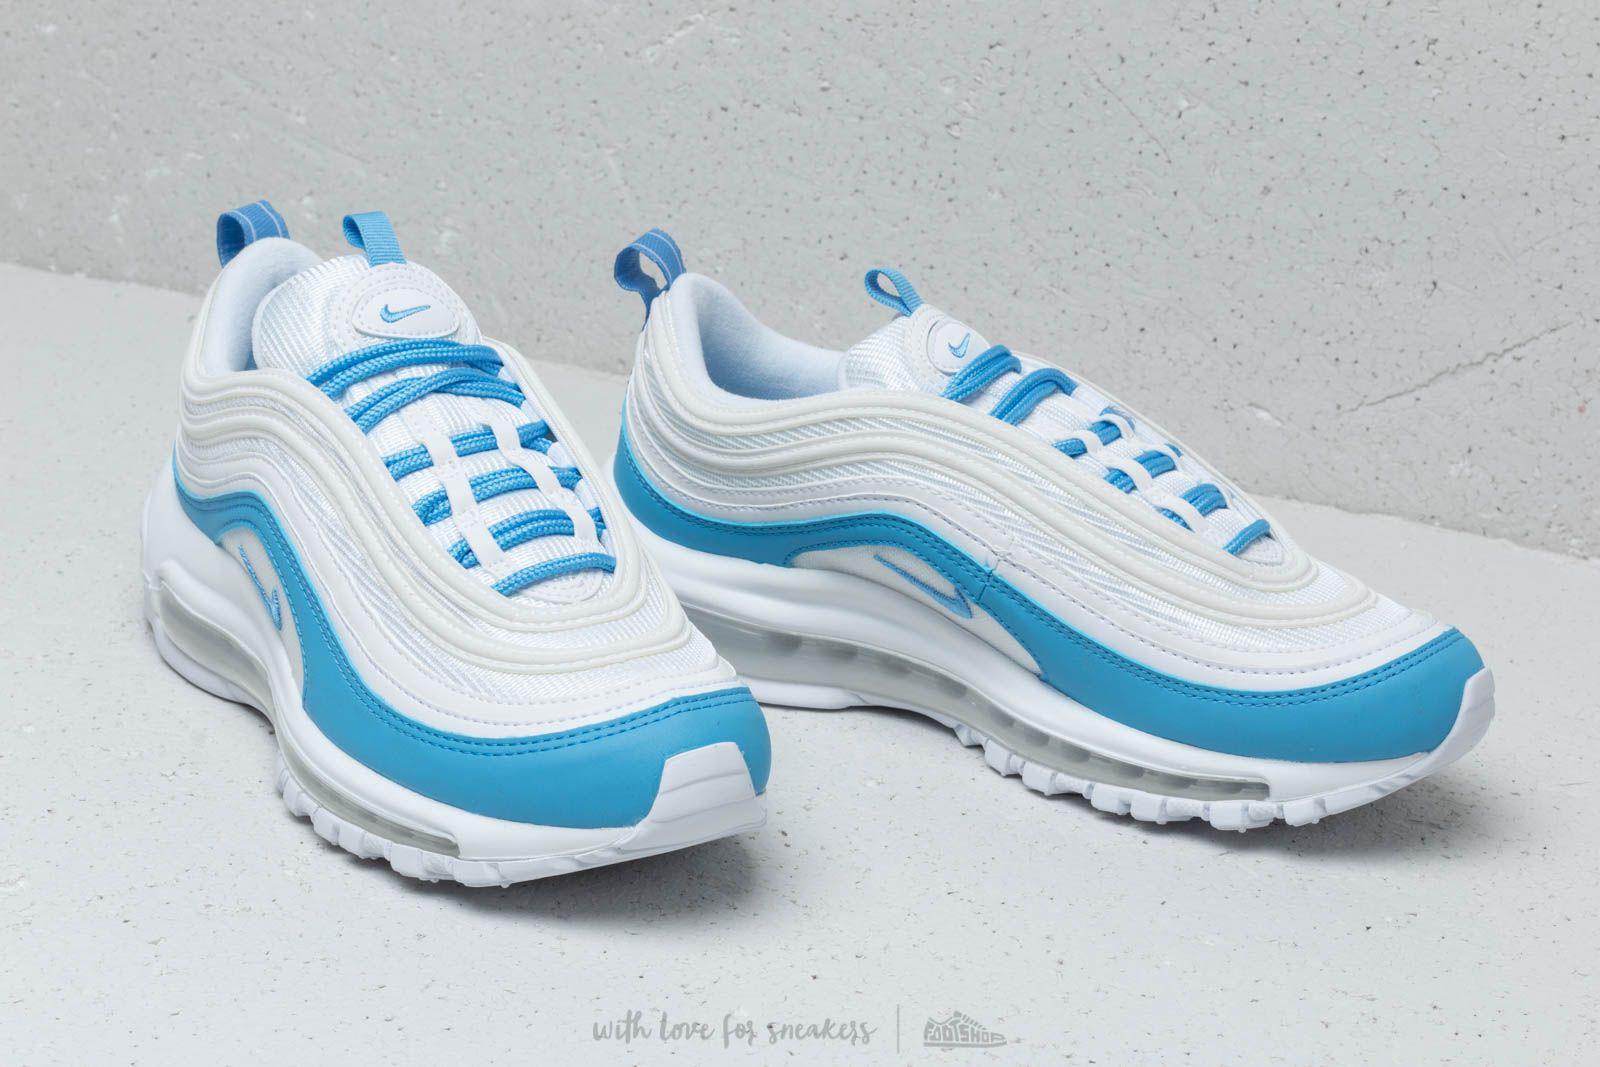 651a6ccddd0af7 Nike - W Air Max 97 Ess White  University Blue - Lyst. View fullscreen